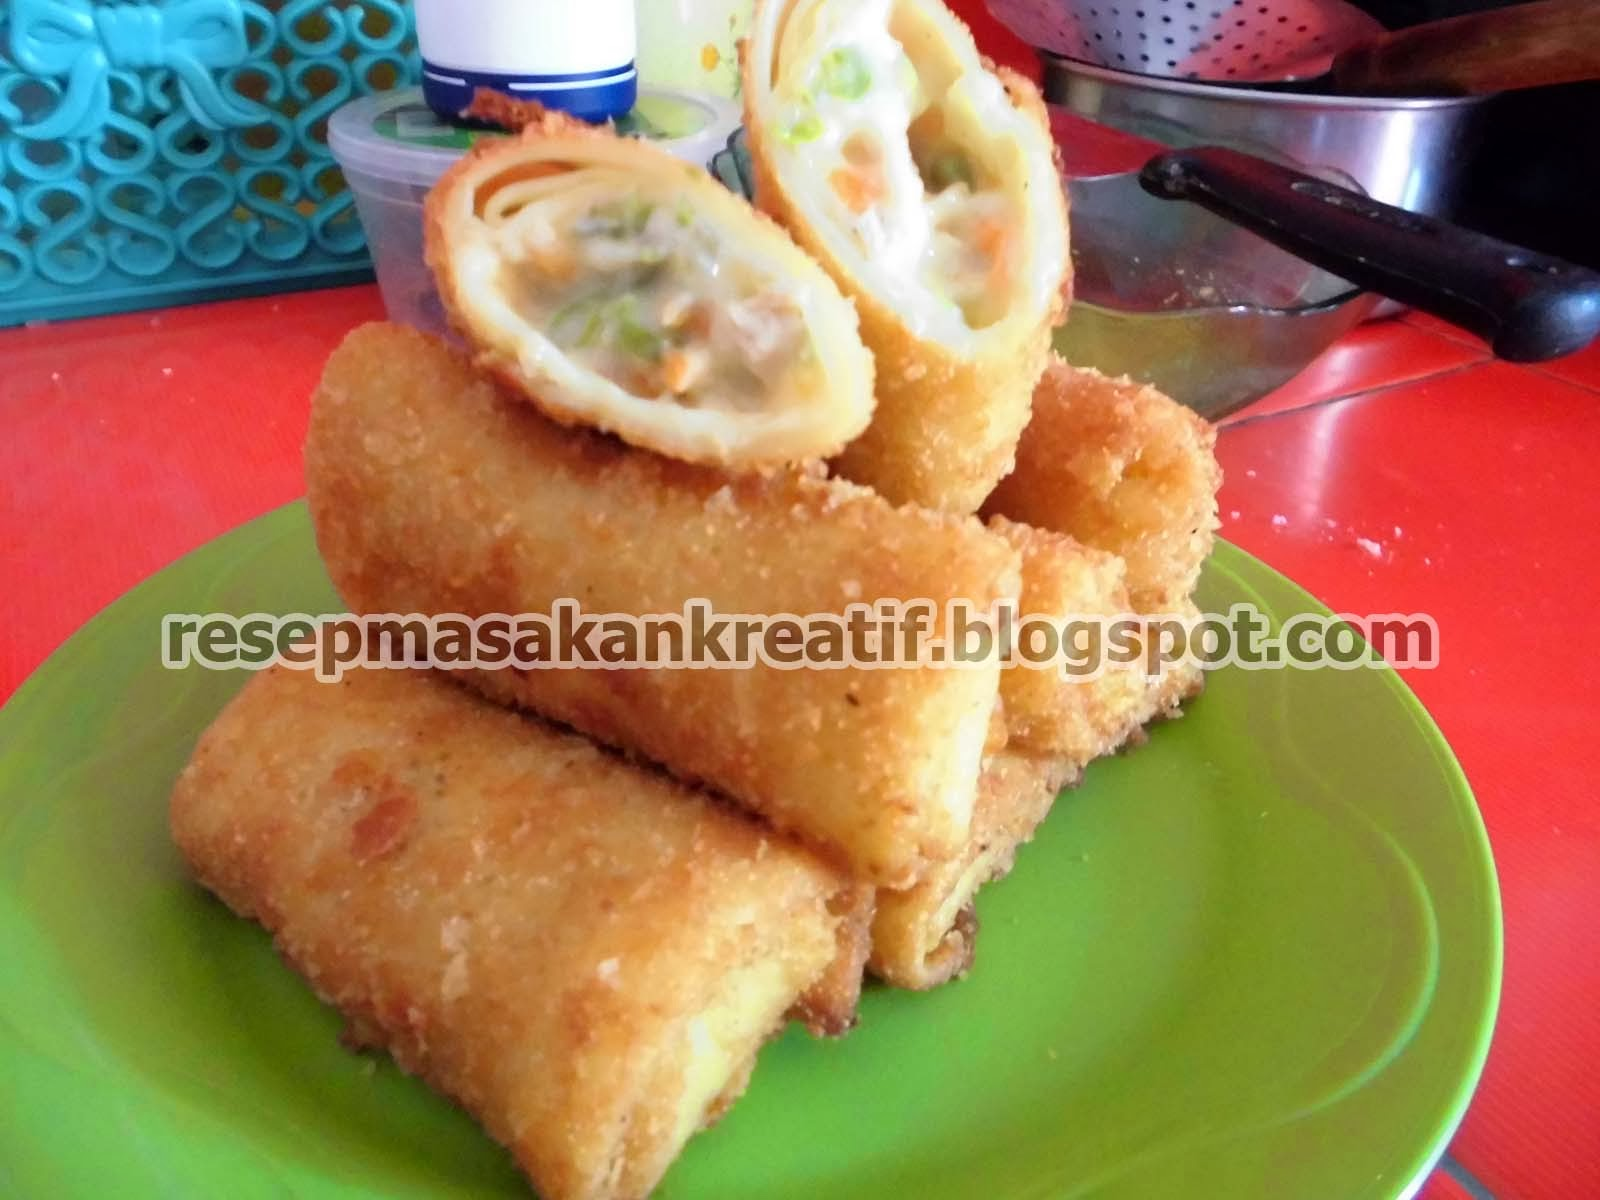 Resep Risoles Keju Mayonnaise Enak Resep Dapur Kita